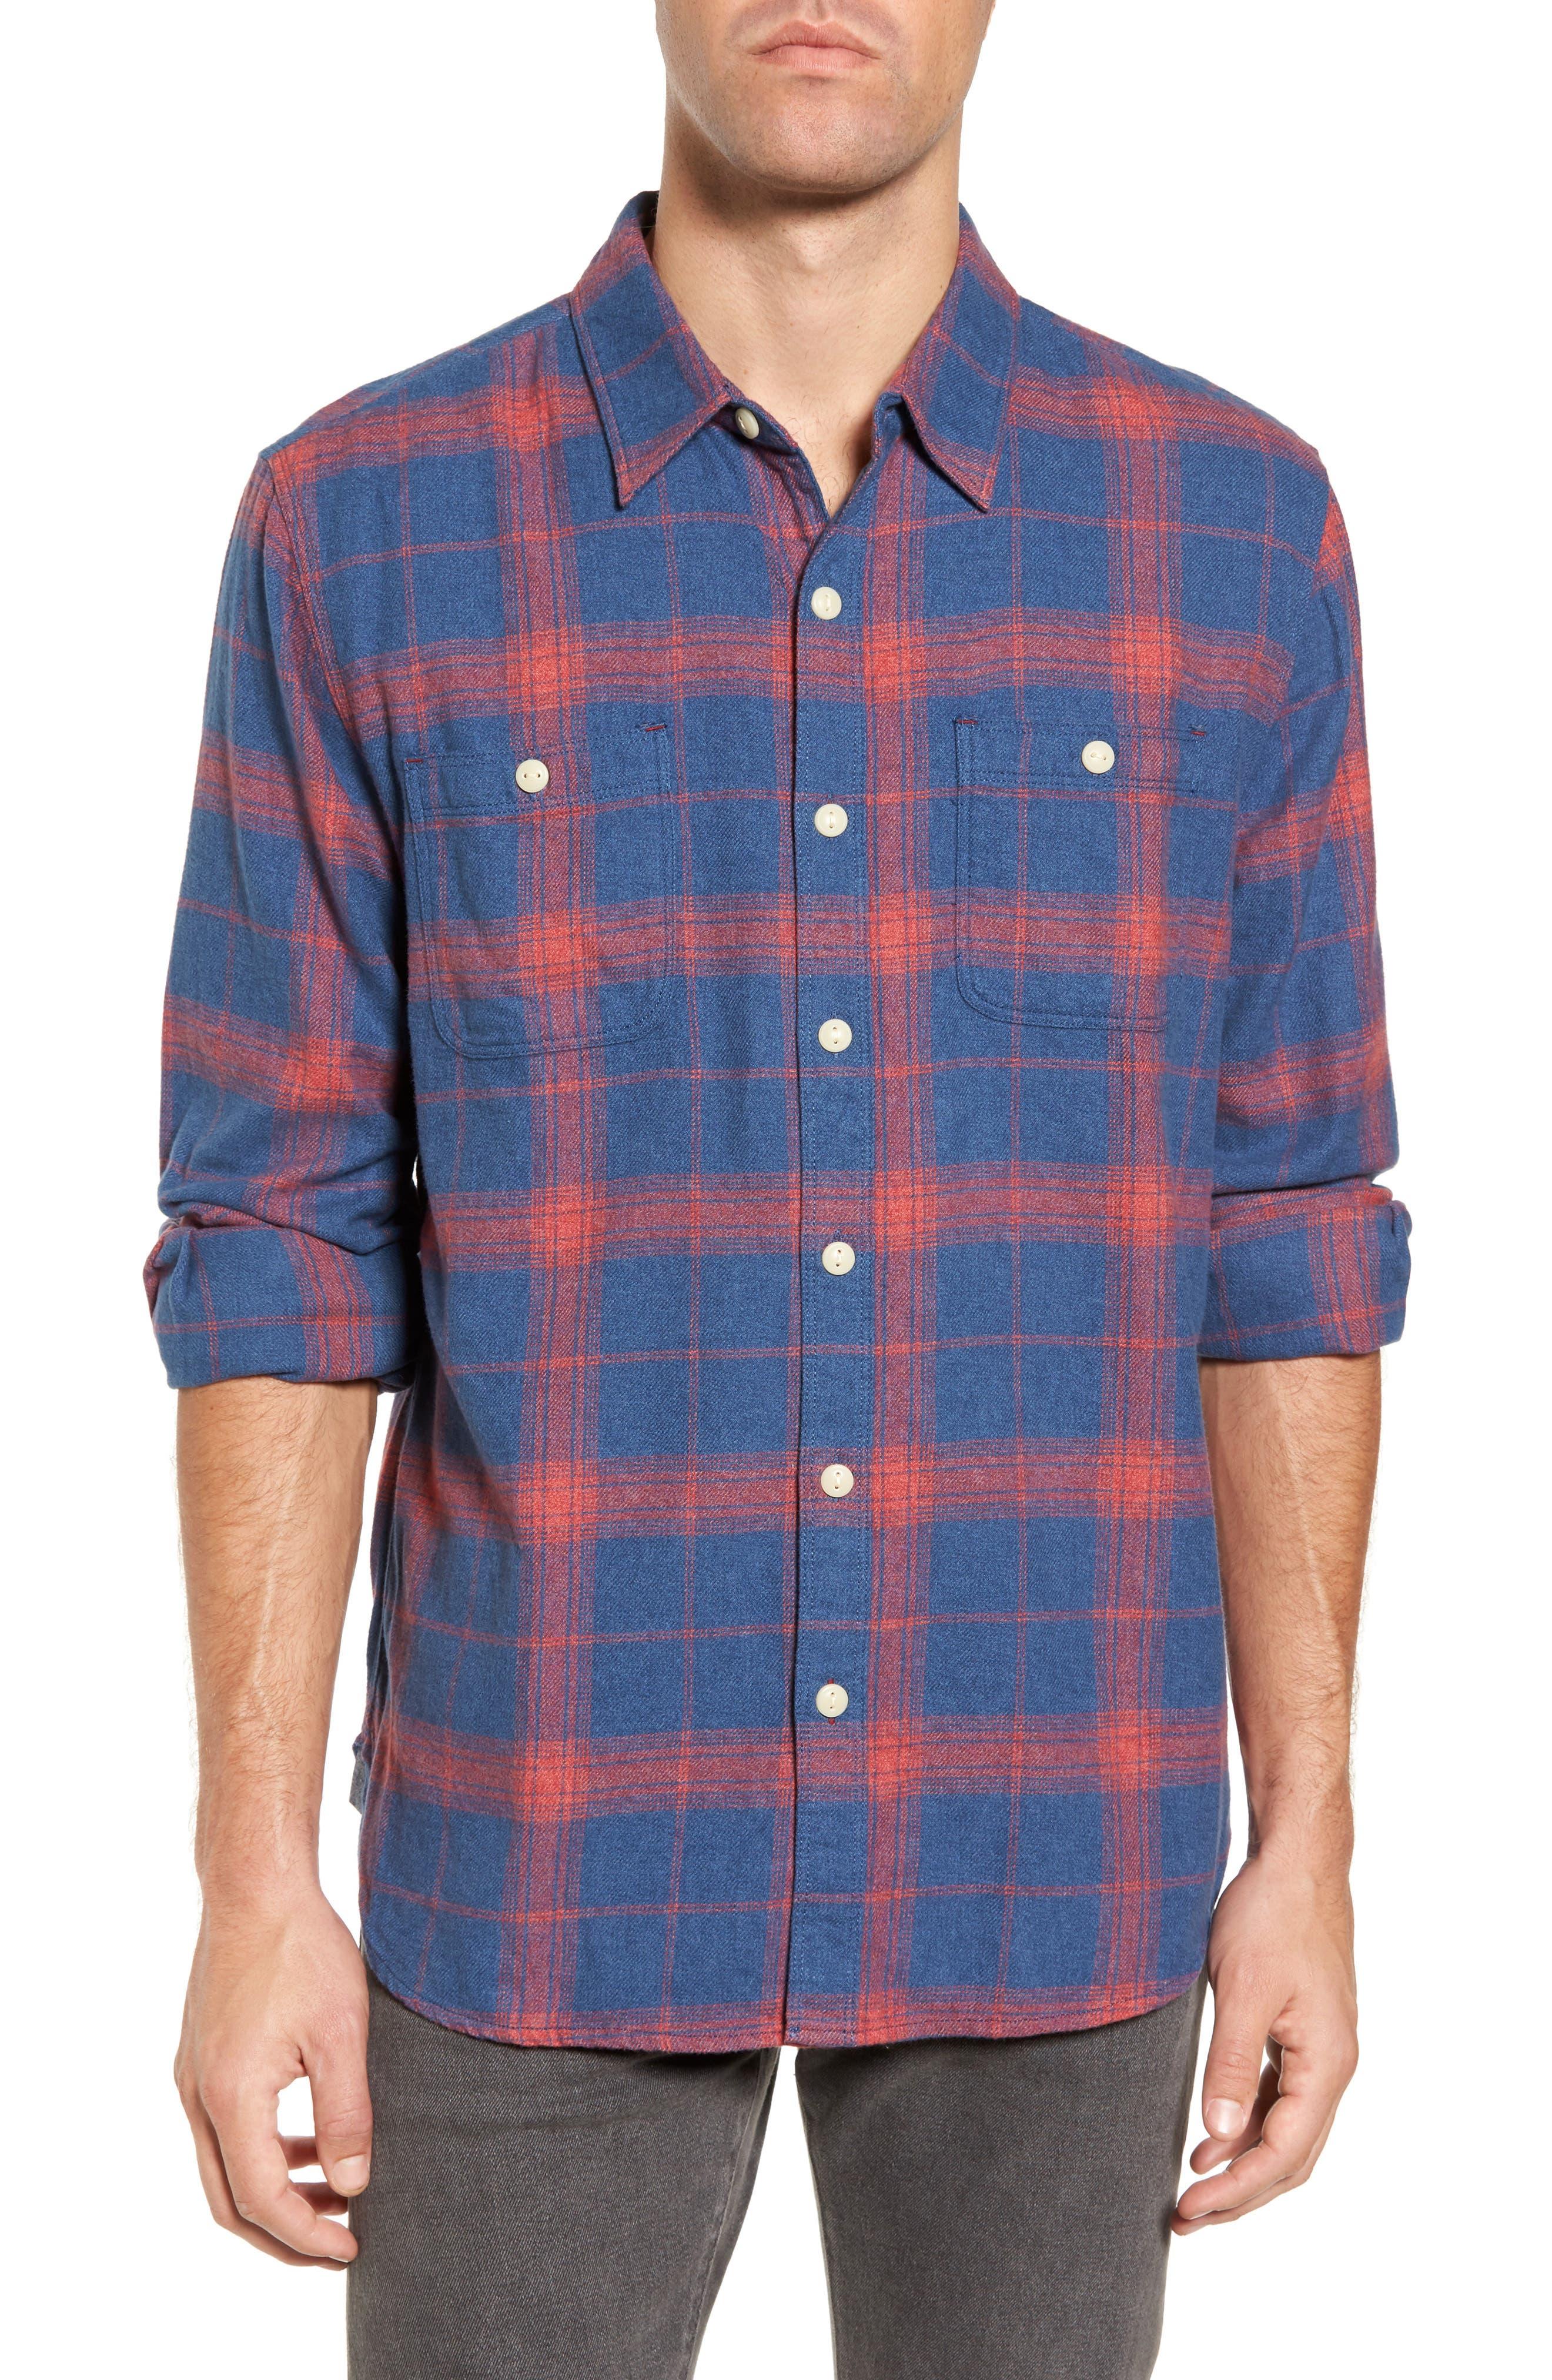 Roadtrip Plaid Flannel Sport Shirt,                             Main thumbnail 1, color,                             Blue/ Red